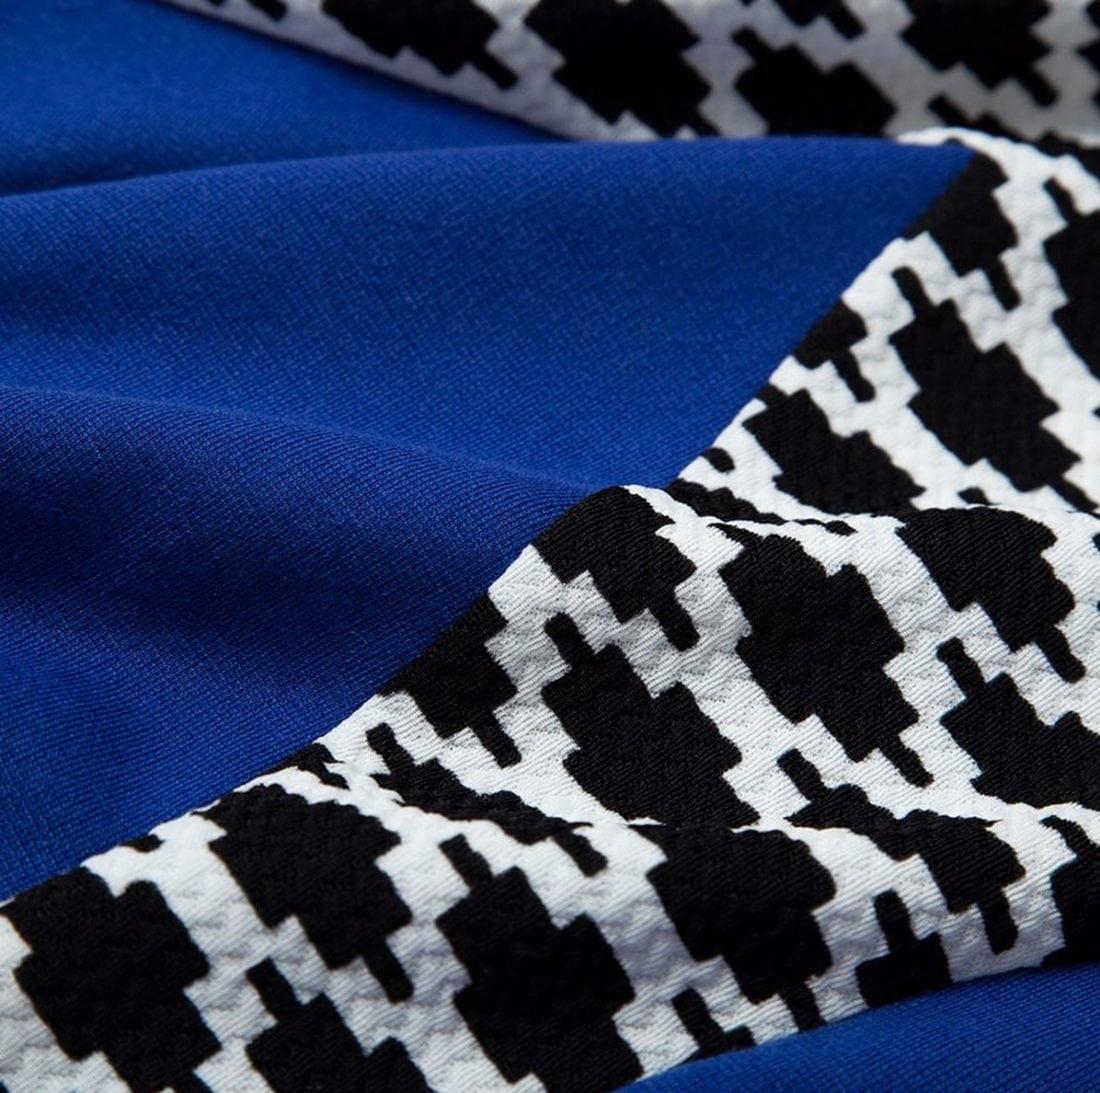 M0187 blueblack6 Office Evening Dresses maureens.com boutique